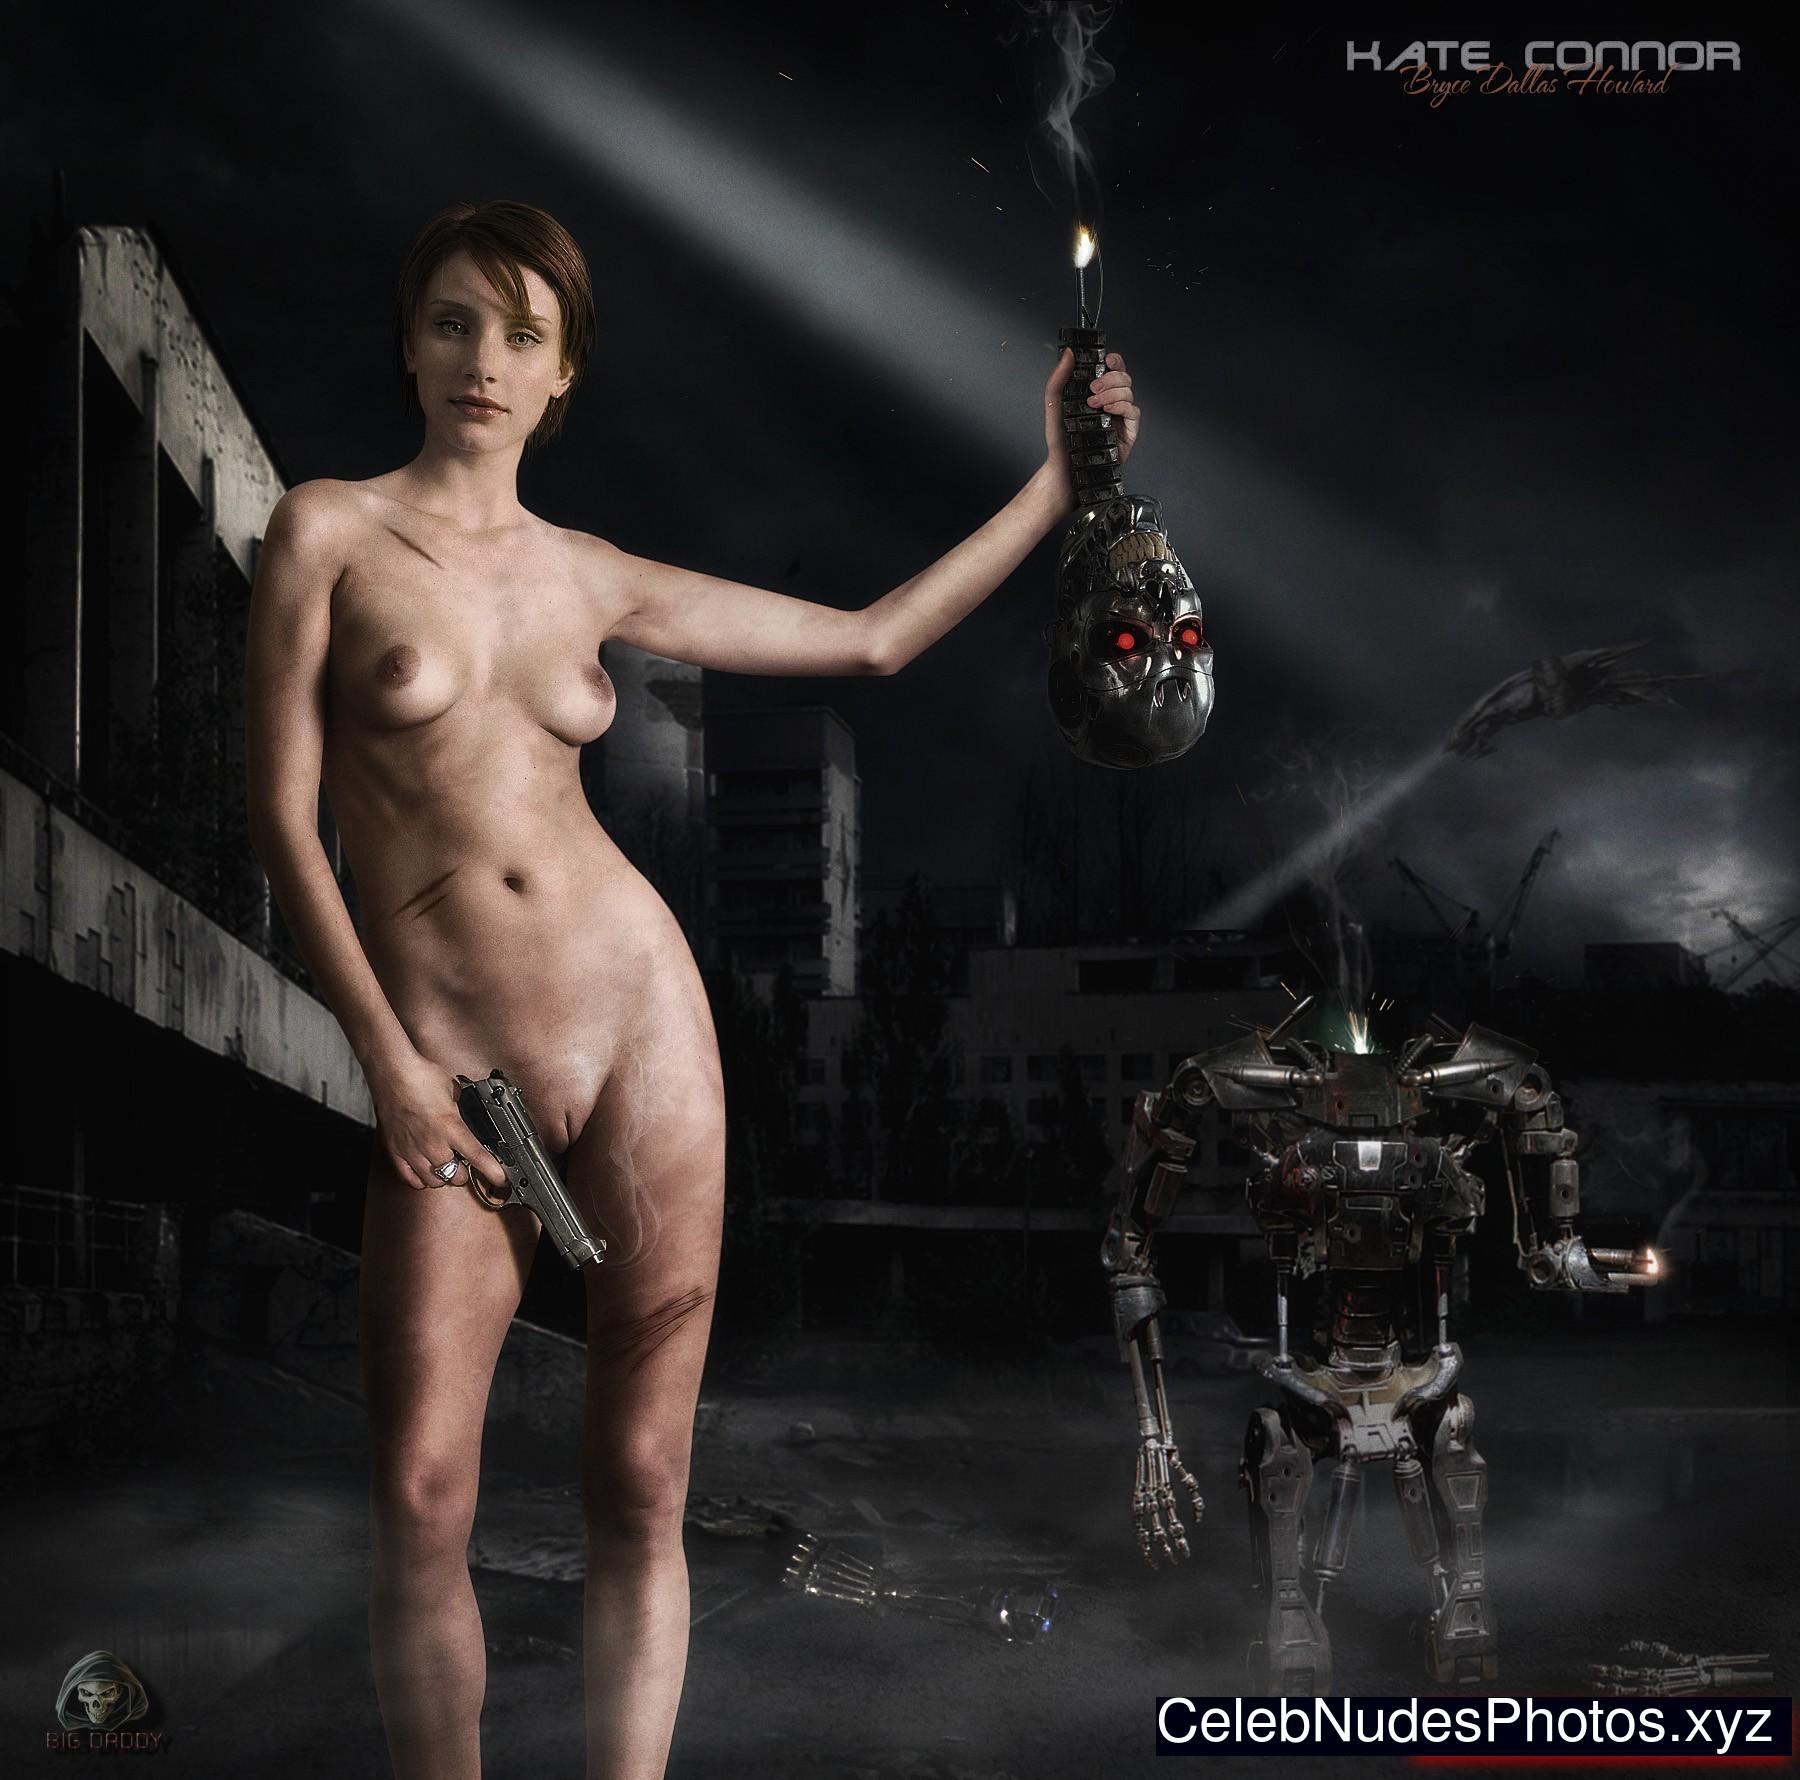 nude magazines online